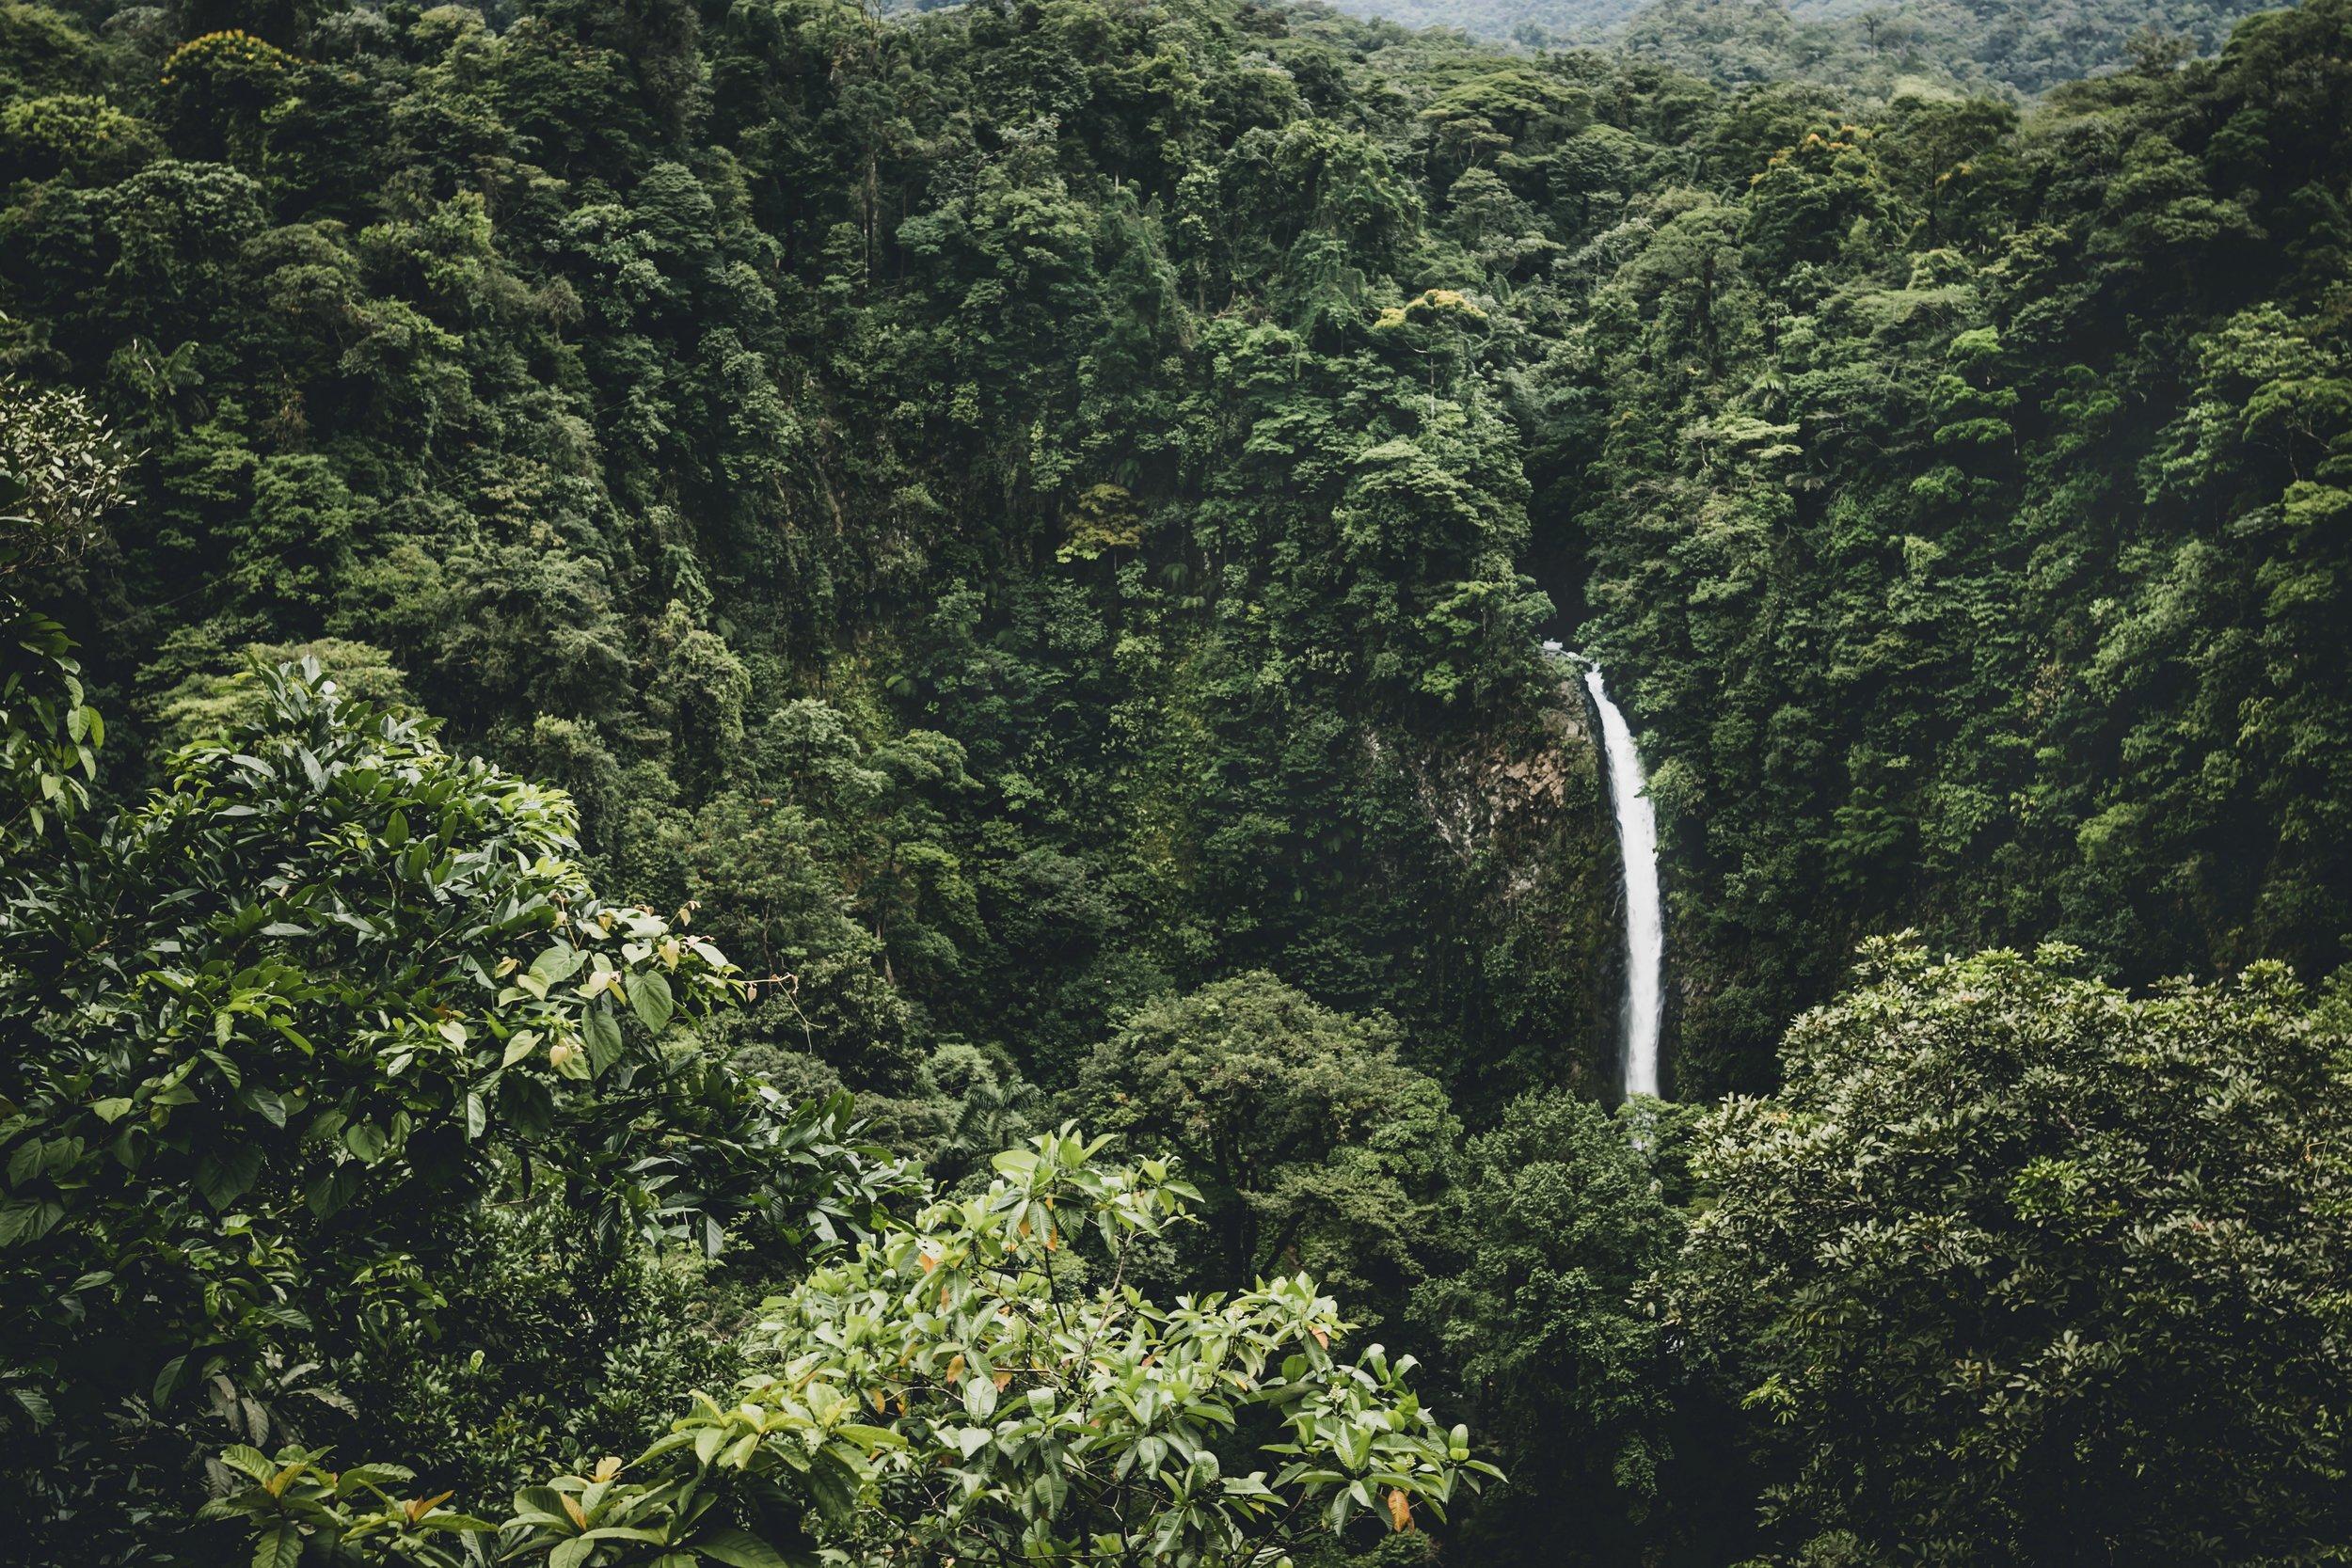 Waterfall in the jungle of Costa Rica